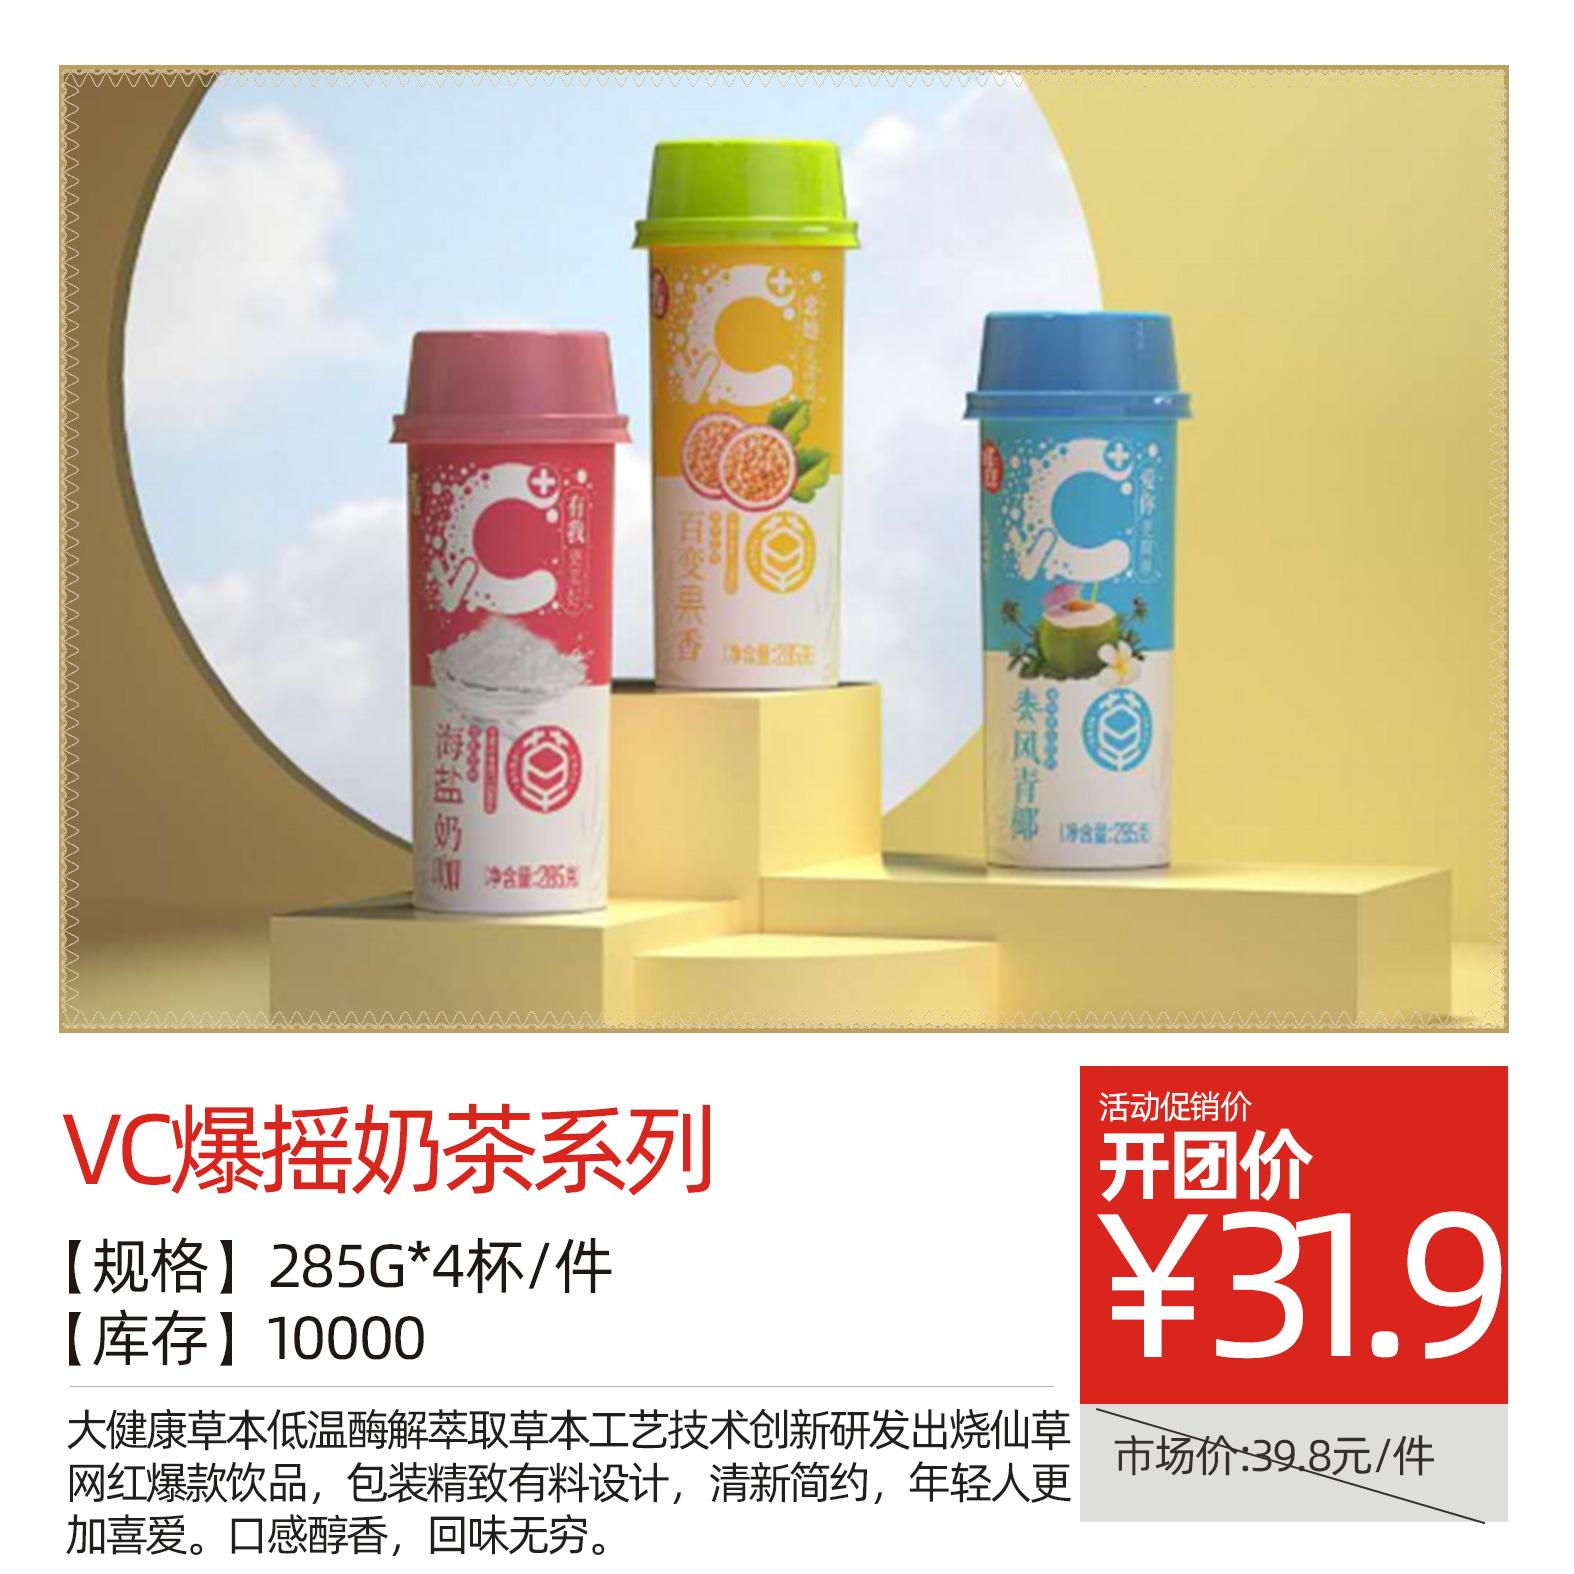 VC爆摇奶茶系列